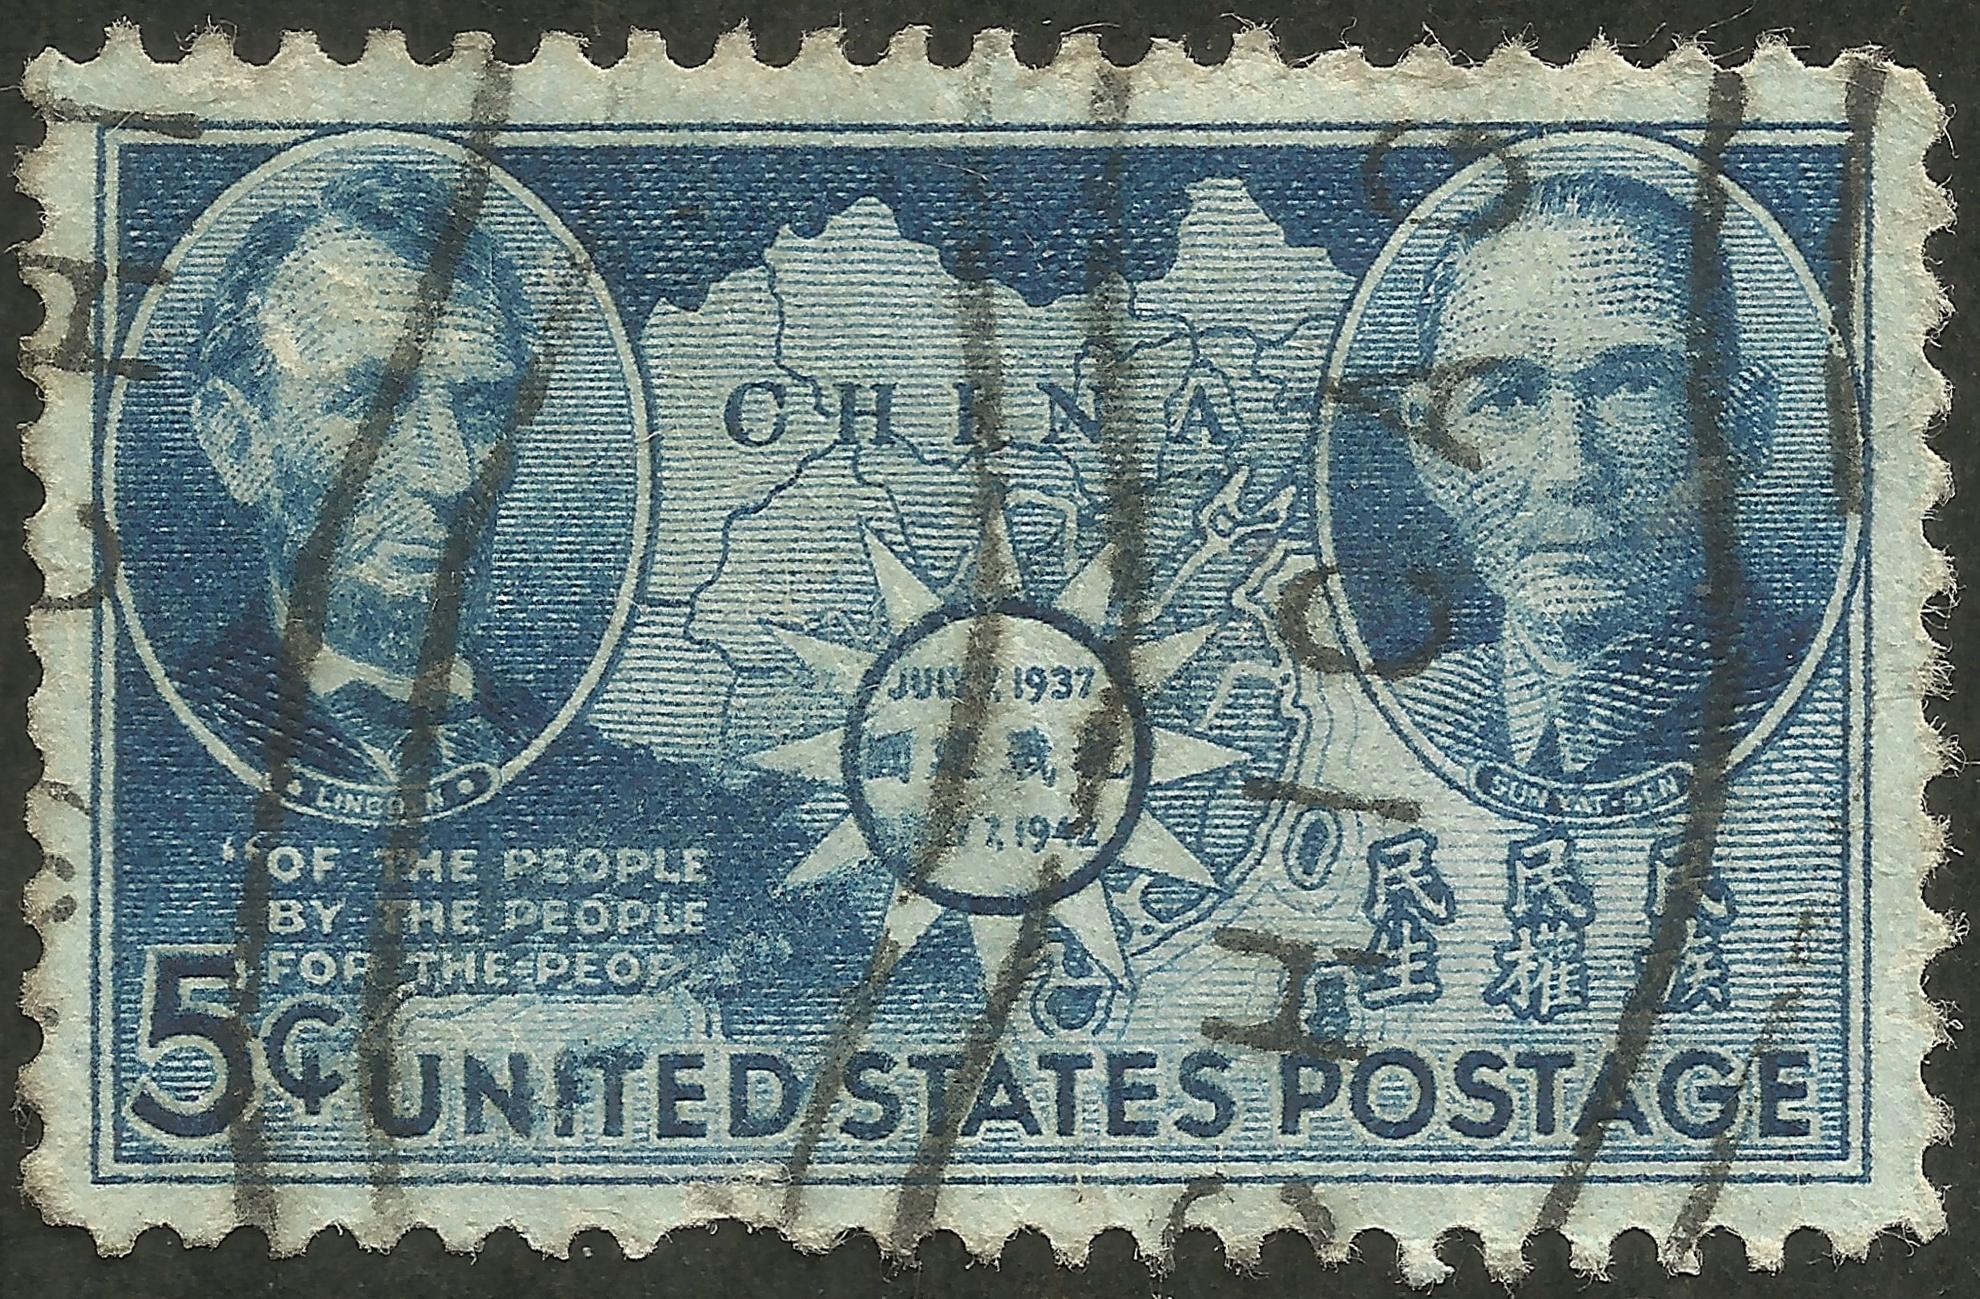 United States - Scott #906 (1942) used